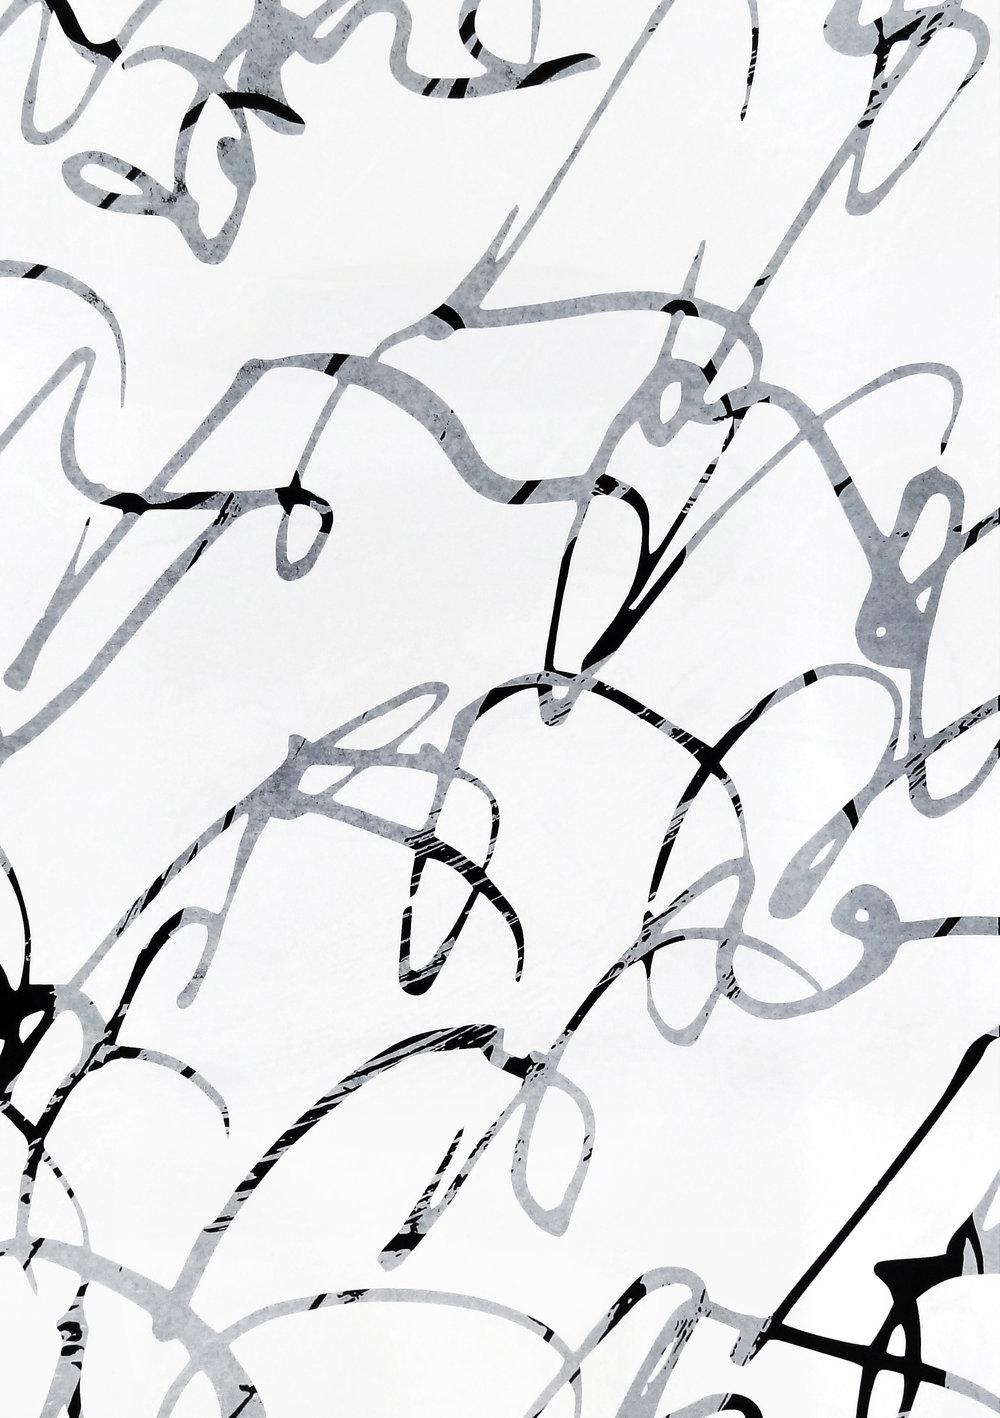 Untitled, 2018 acrylic on paper one-off screenprint 57 x 40 cm (28-18)